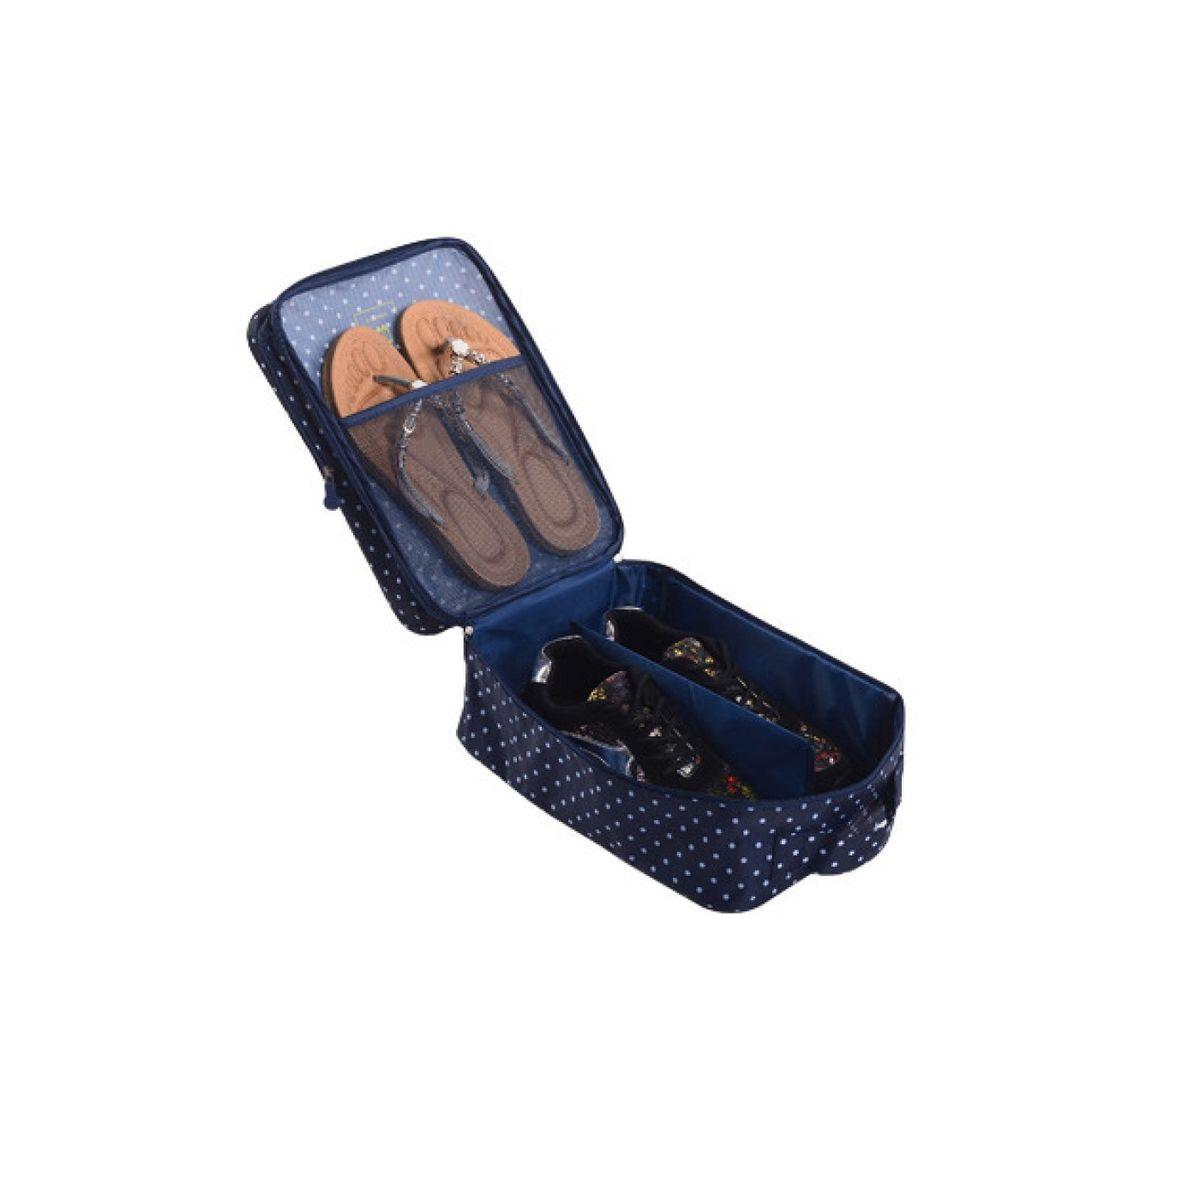 Органайзер для обуви Homsu, 32 x 20 x 13 см